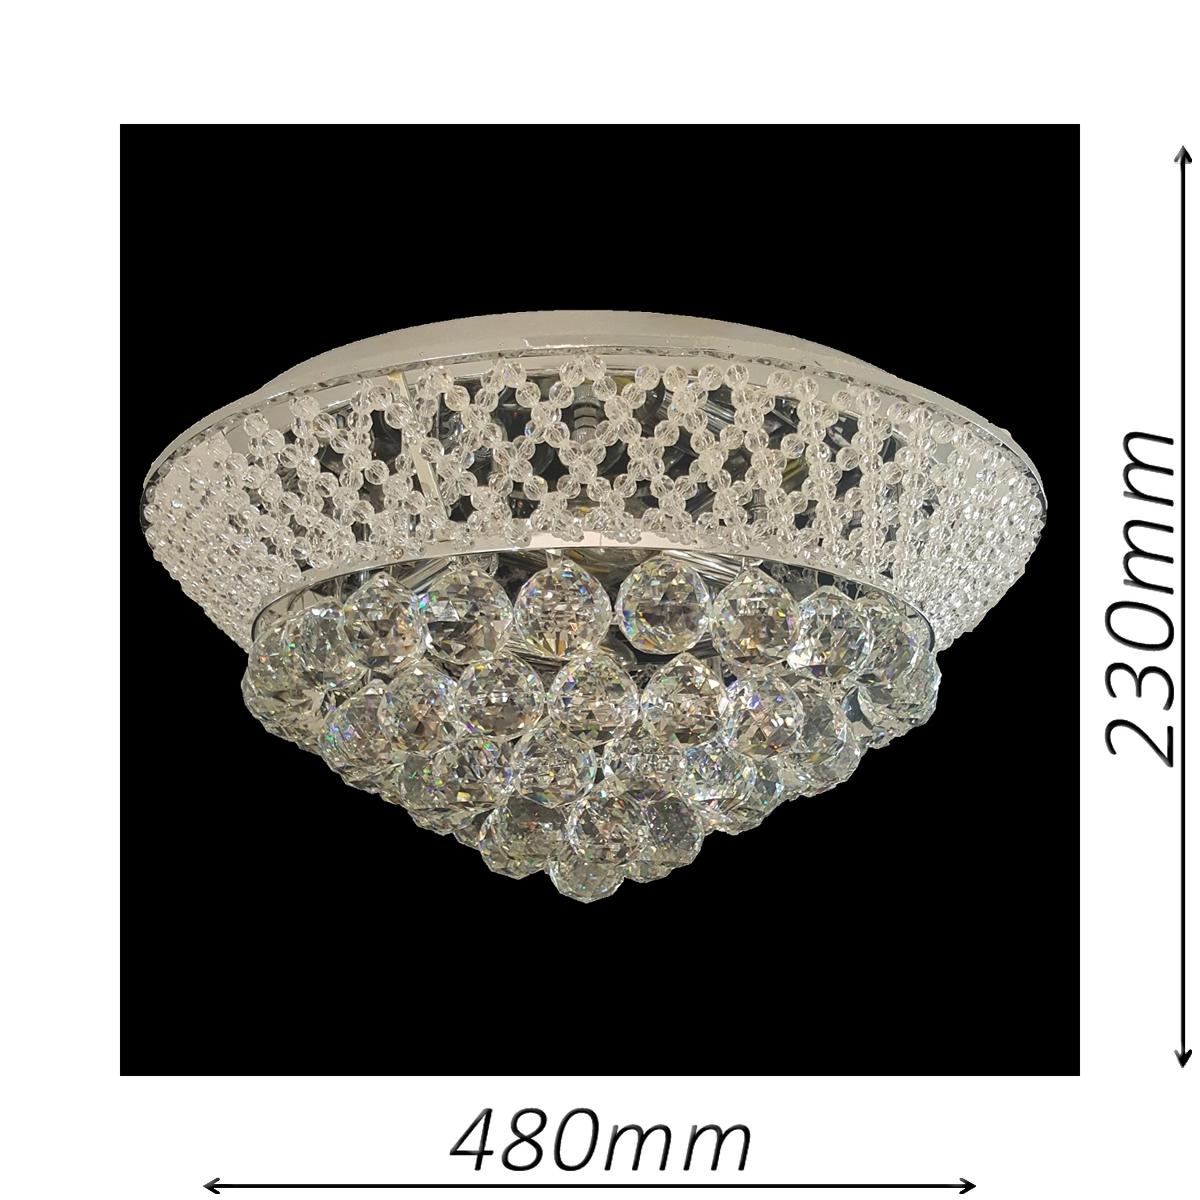 Cumbria 480 Chrome Ceiling Light - CTCCUMB04480CH